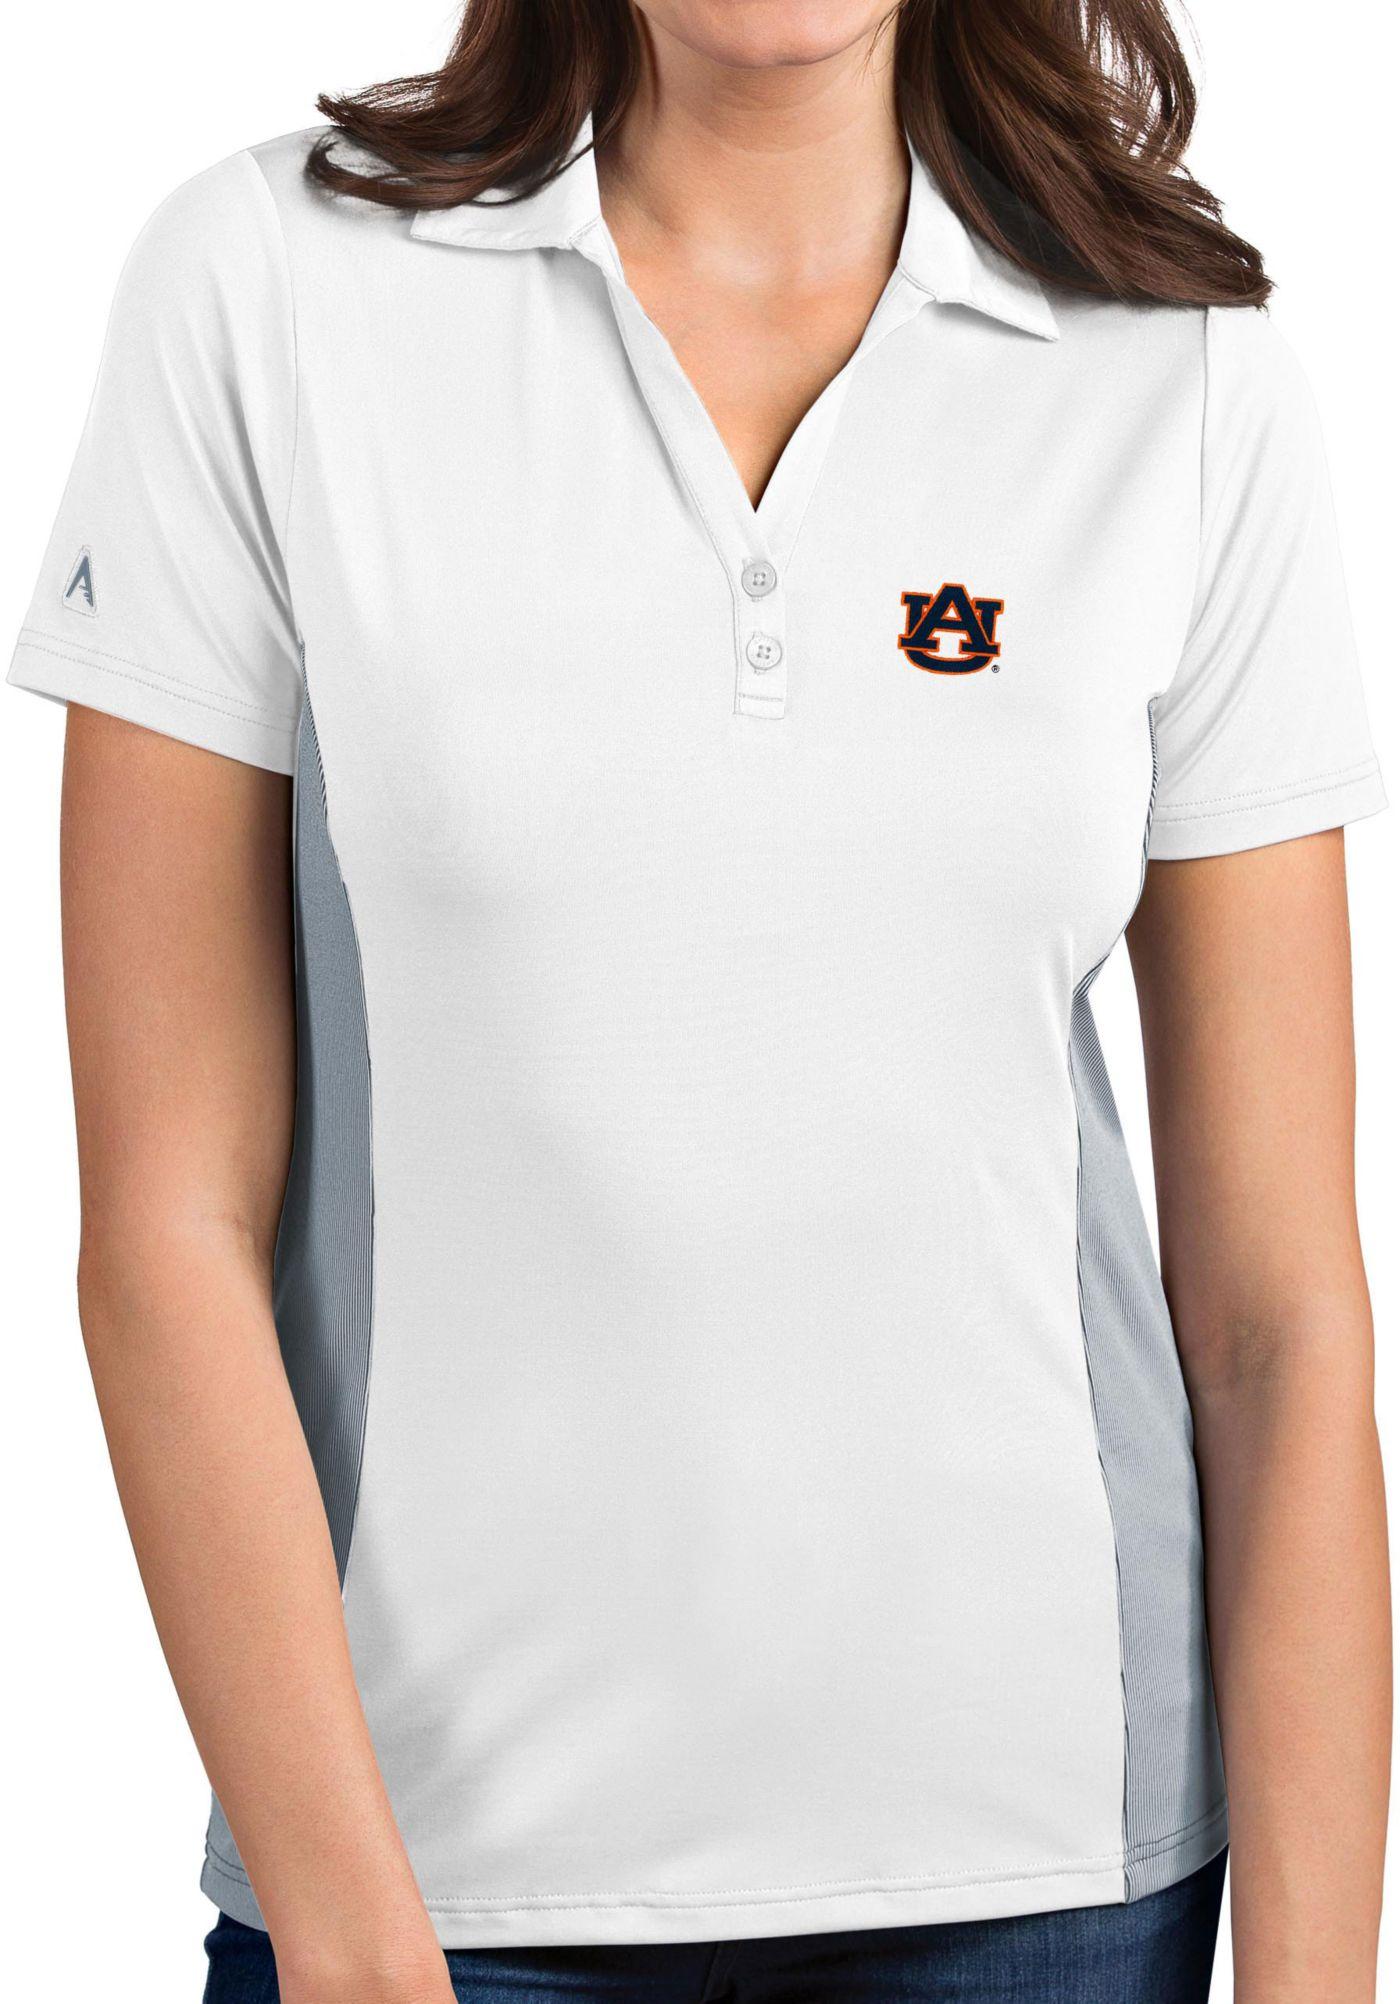 Antigua Women's Auburn Tigers Venture White Polo